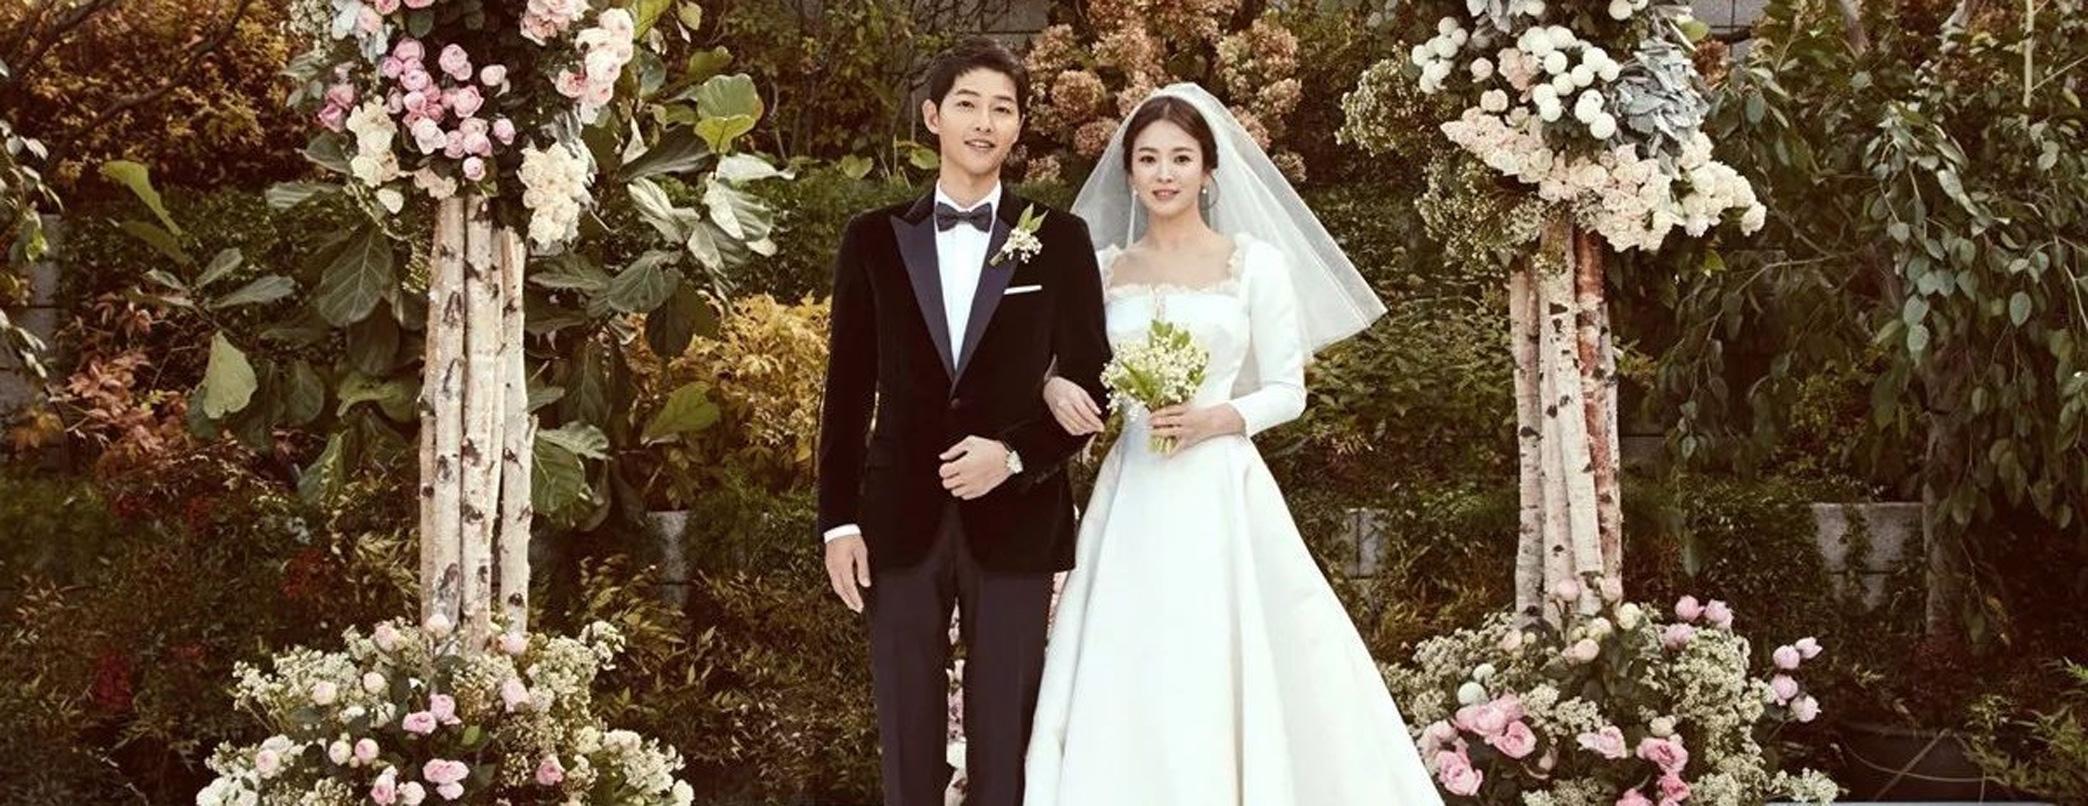 Simak Gaun Pengantin Pilihan Aktris Song Hye Kyo dari Dior